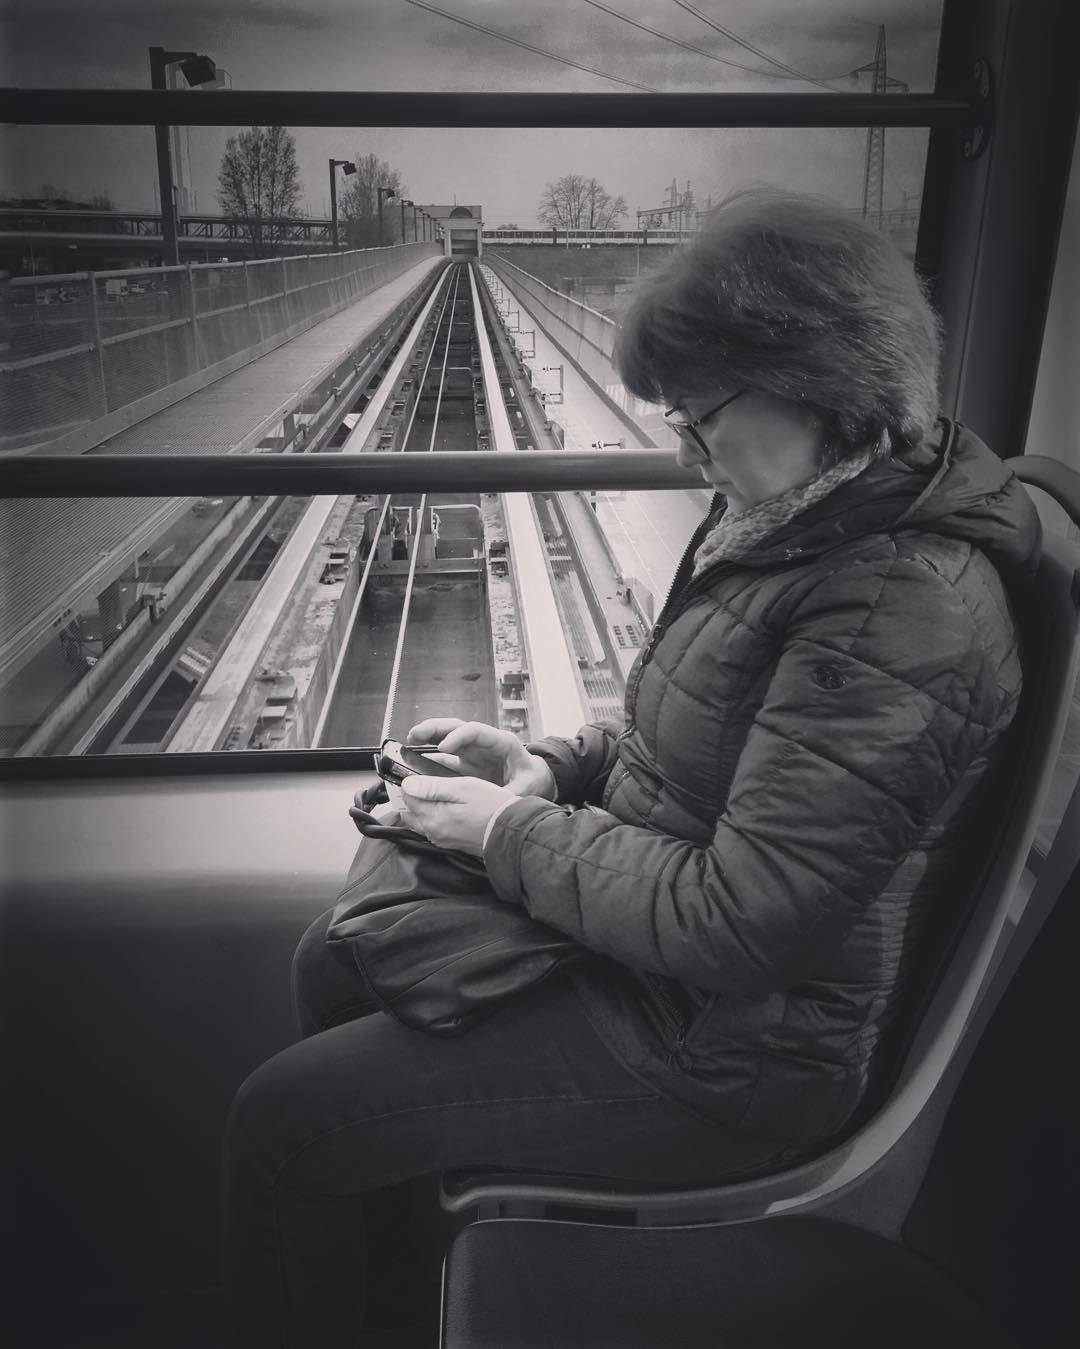 Train readings | #ShotOniPhone6S #ProCamera | Snapseed